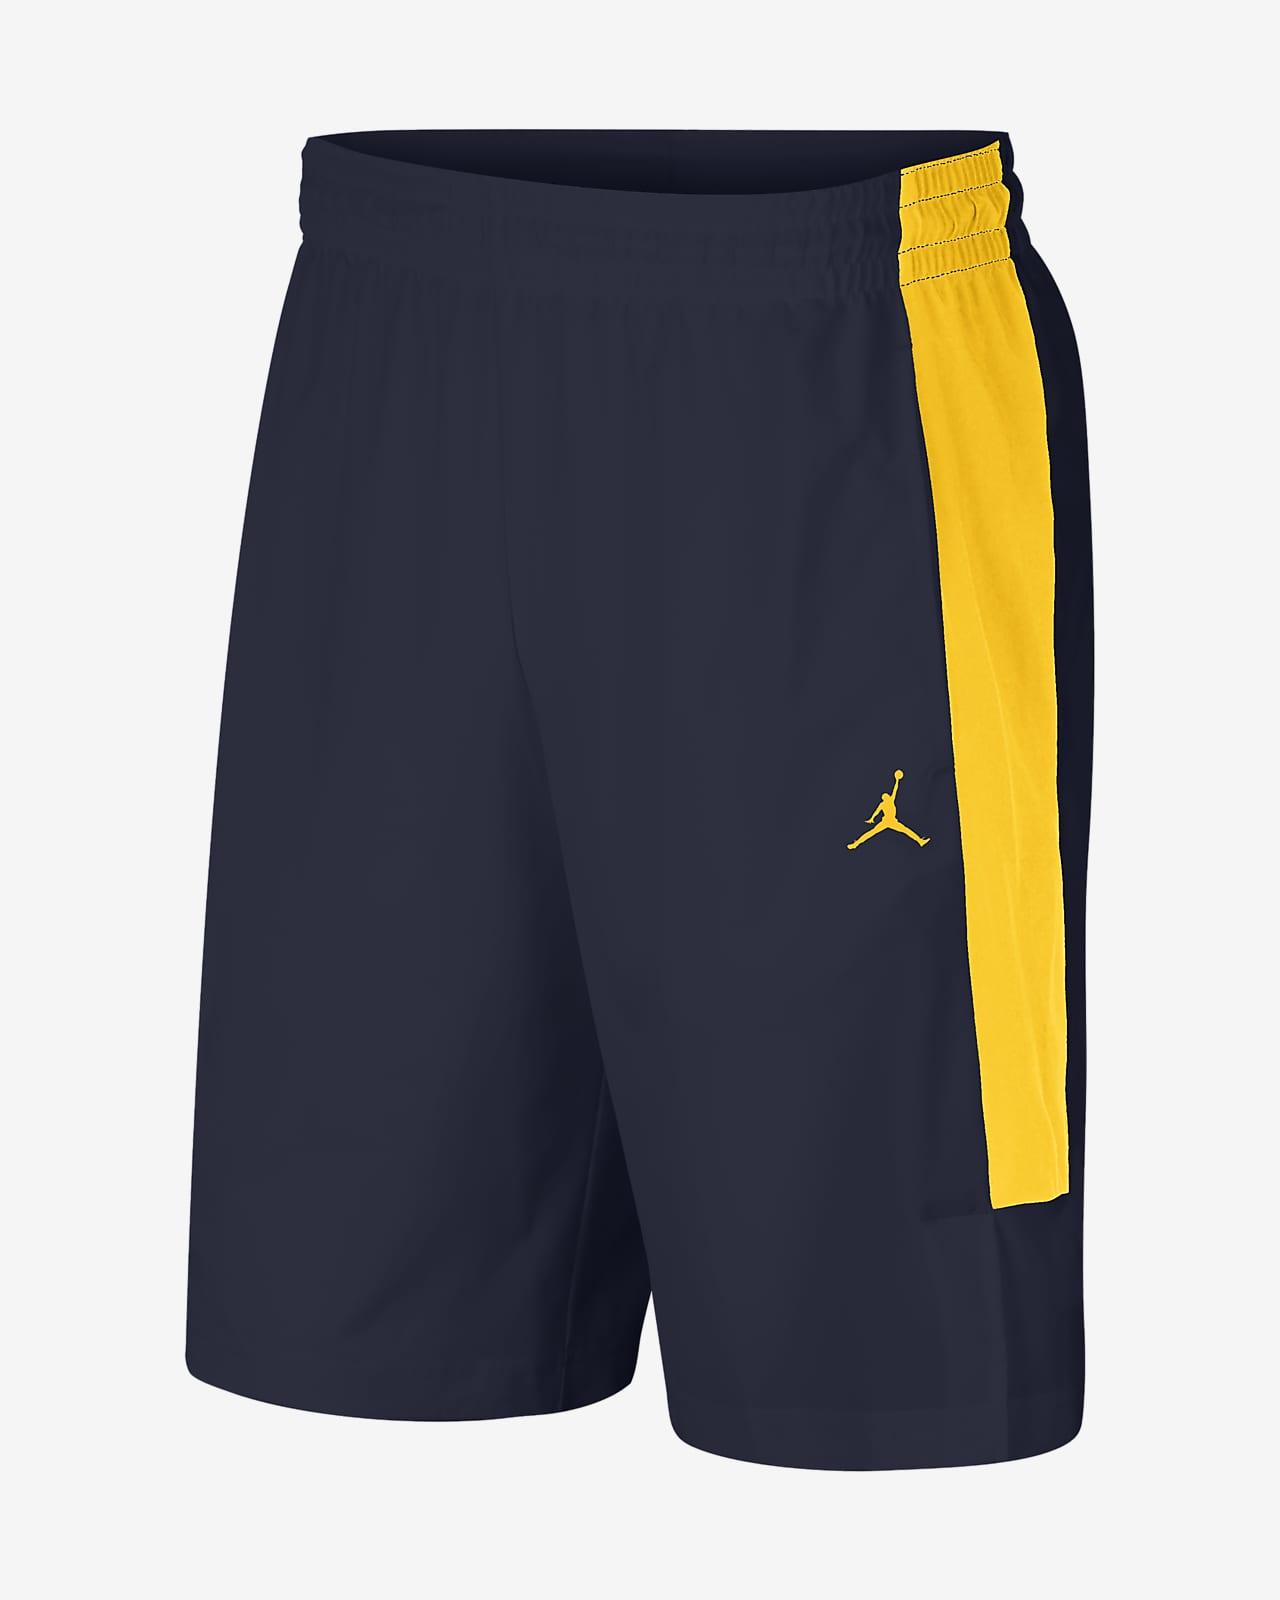 Jordan 23 Alpha (Michigan) Men's Woven Shorts